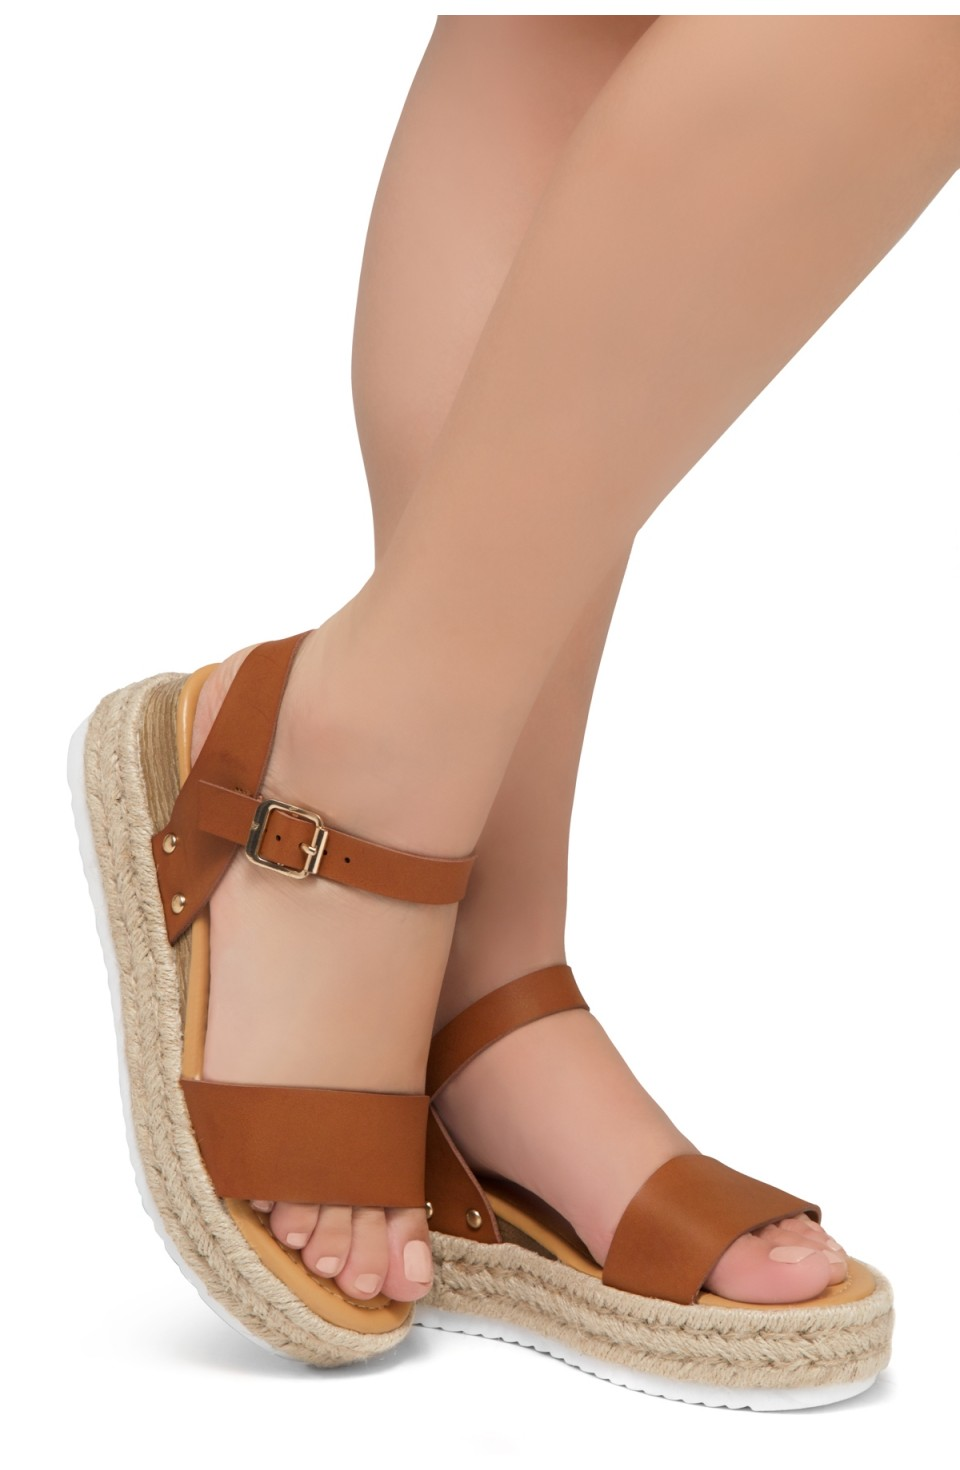 Shoe Land Legossa-Women's Open Toe Ankle Strap Platform Wedge Shoes Casual Espadrilles Trim Flatform Studded Wedge Sandals (Cognac)